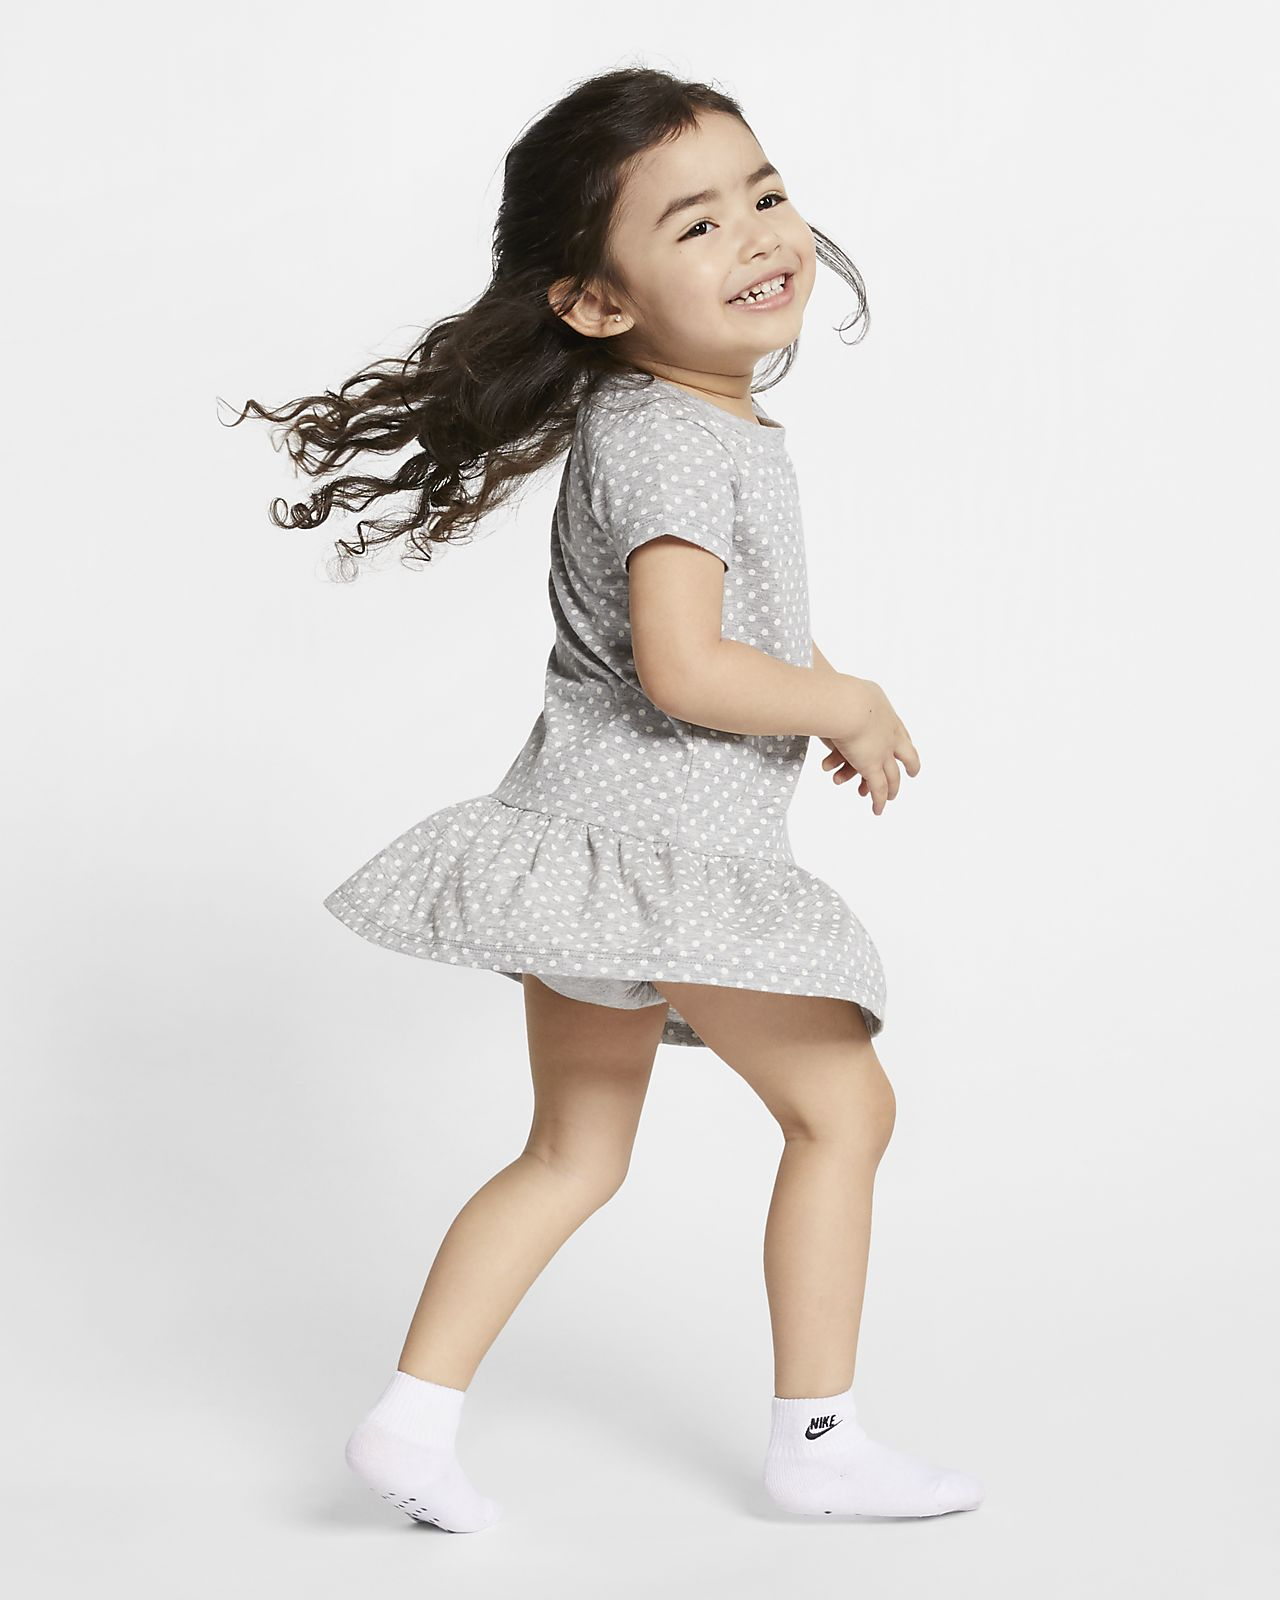 c094f496790 Φόρεμα Nike Sportswear για βρέφη (12-24M). Nike.com GR